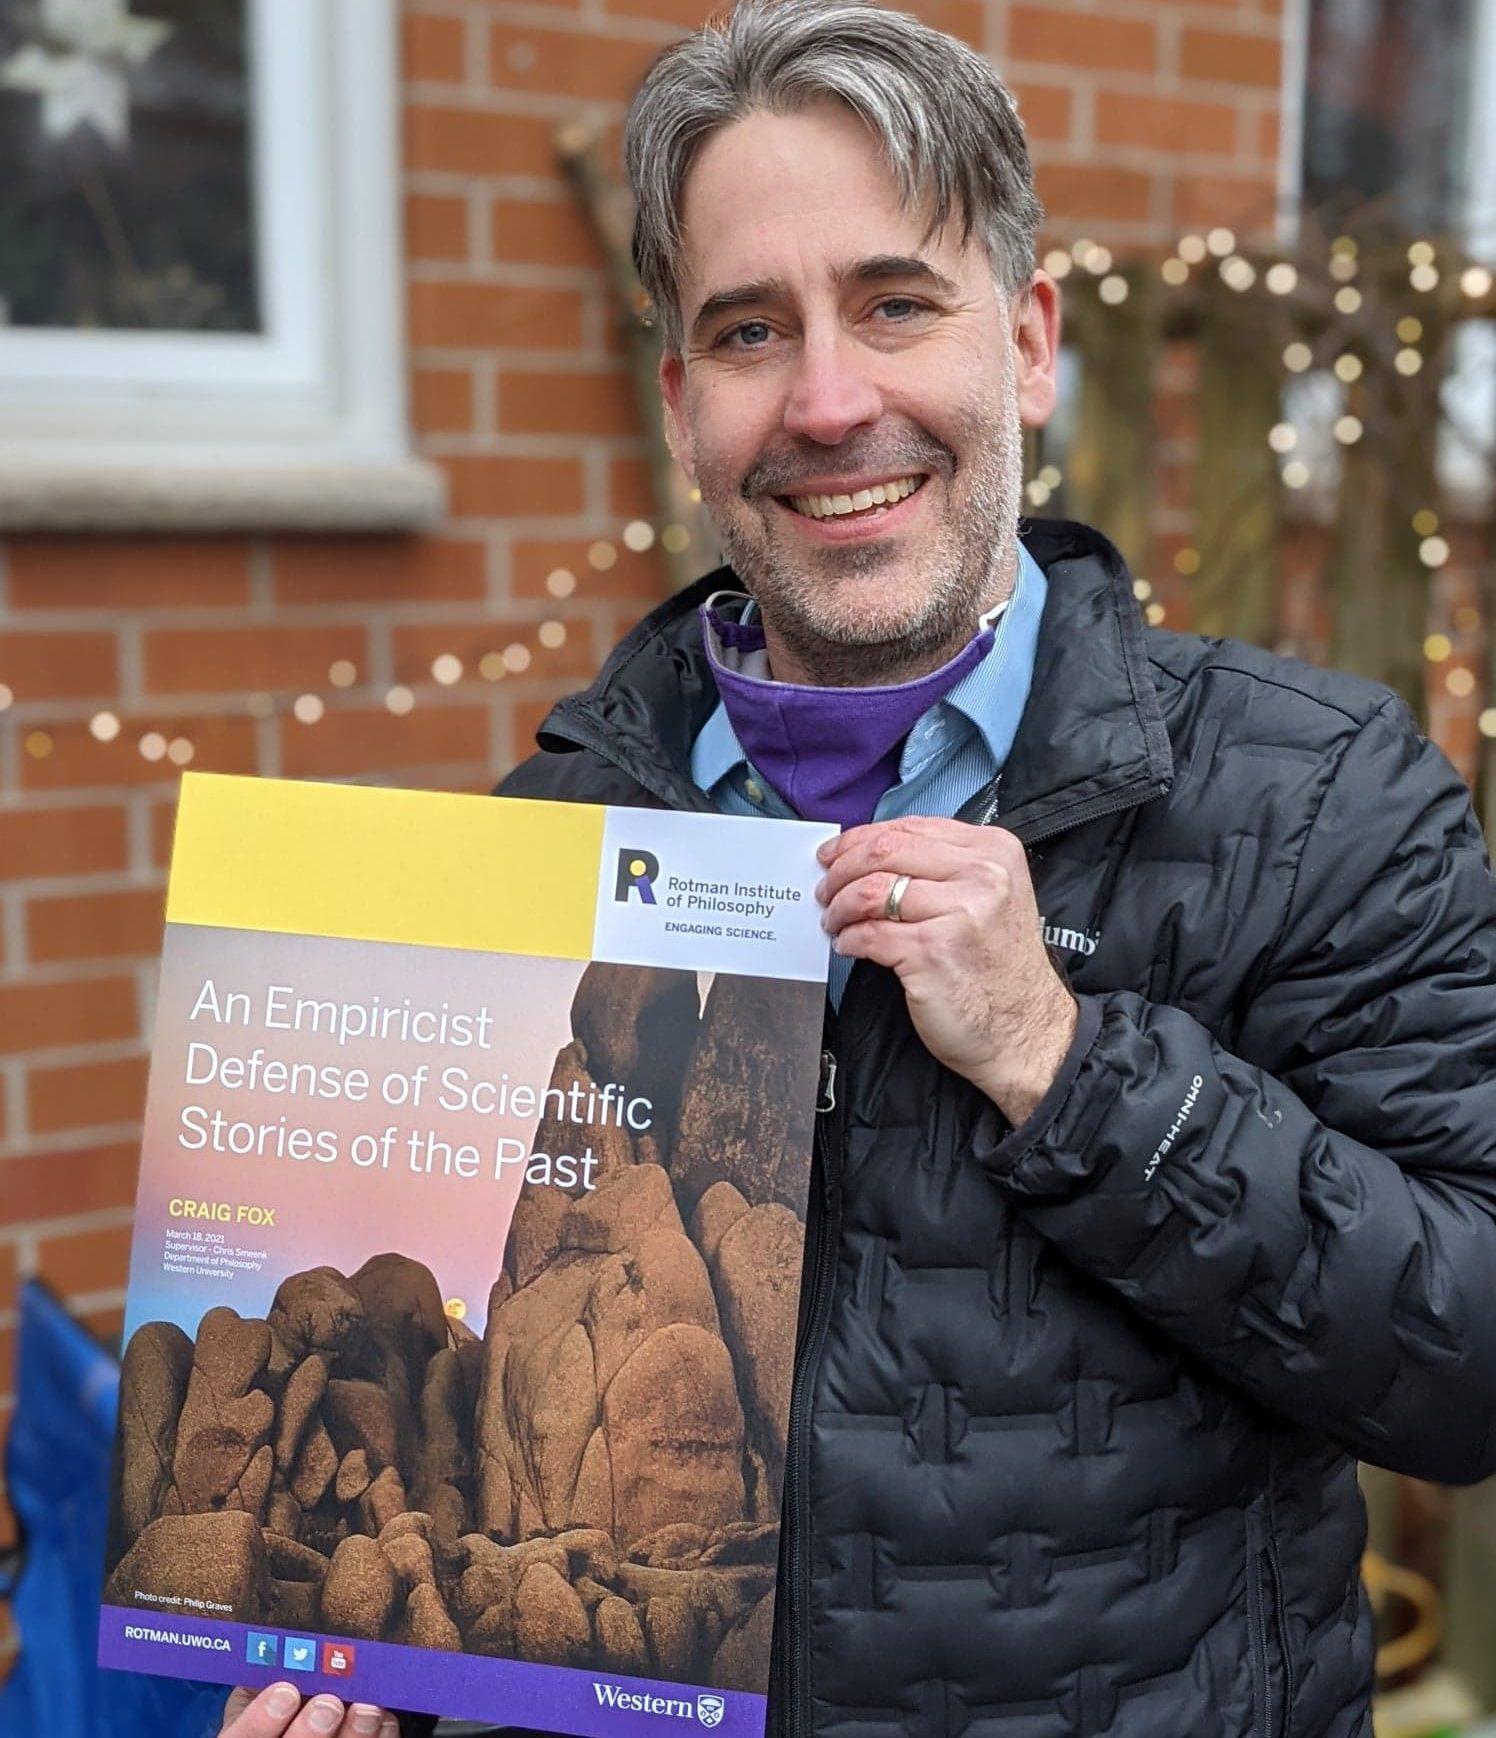 Craig Fox holding his talk's poster